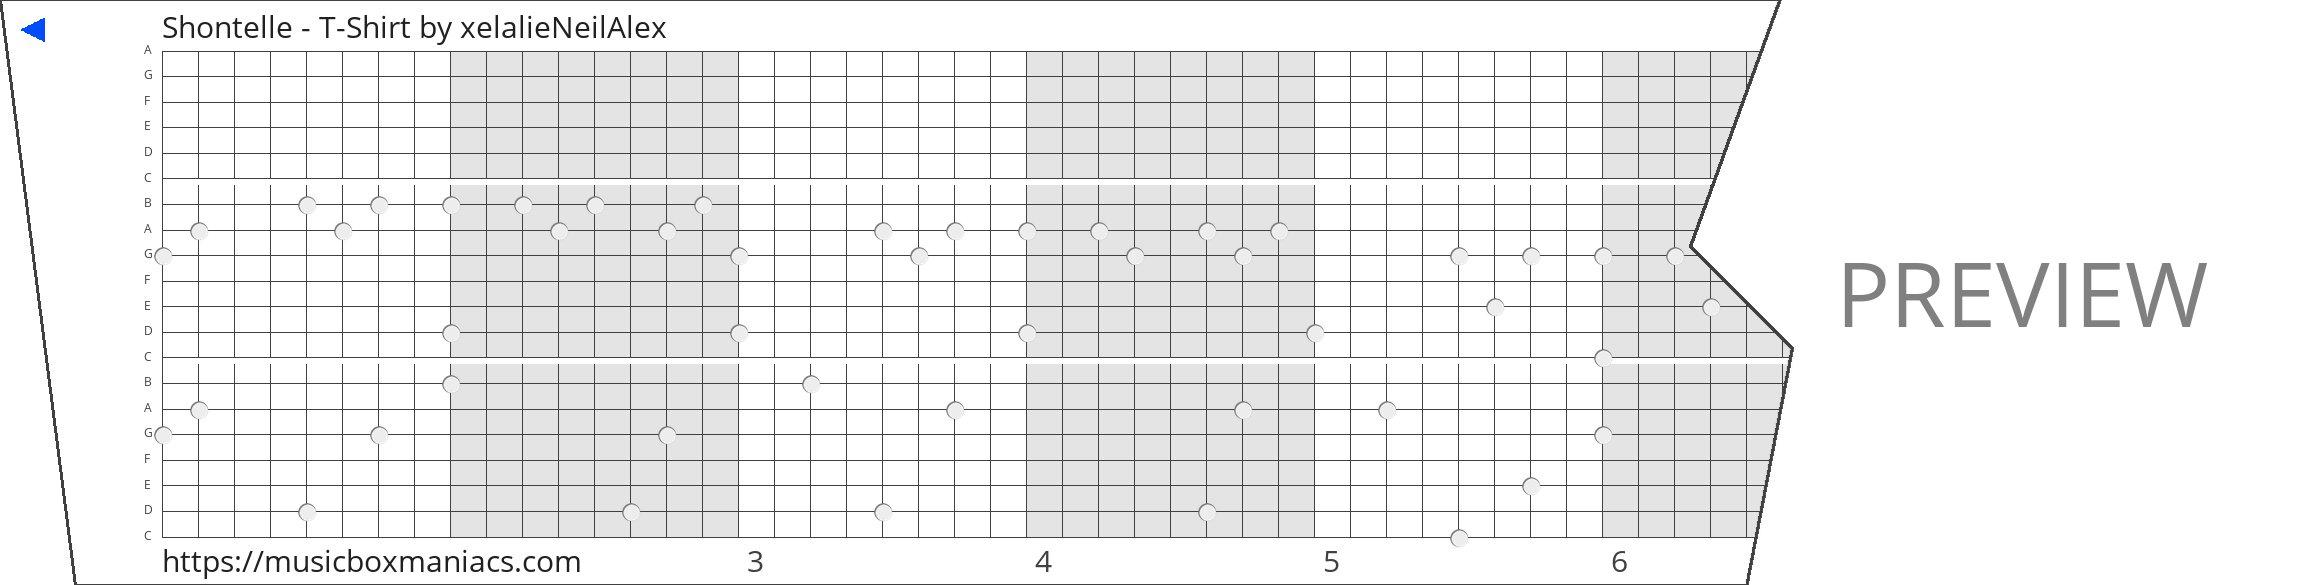 Shontelle - T-Shirt 20 note music box paper strip